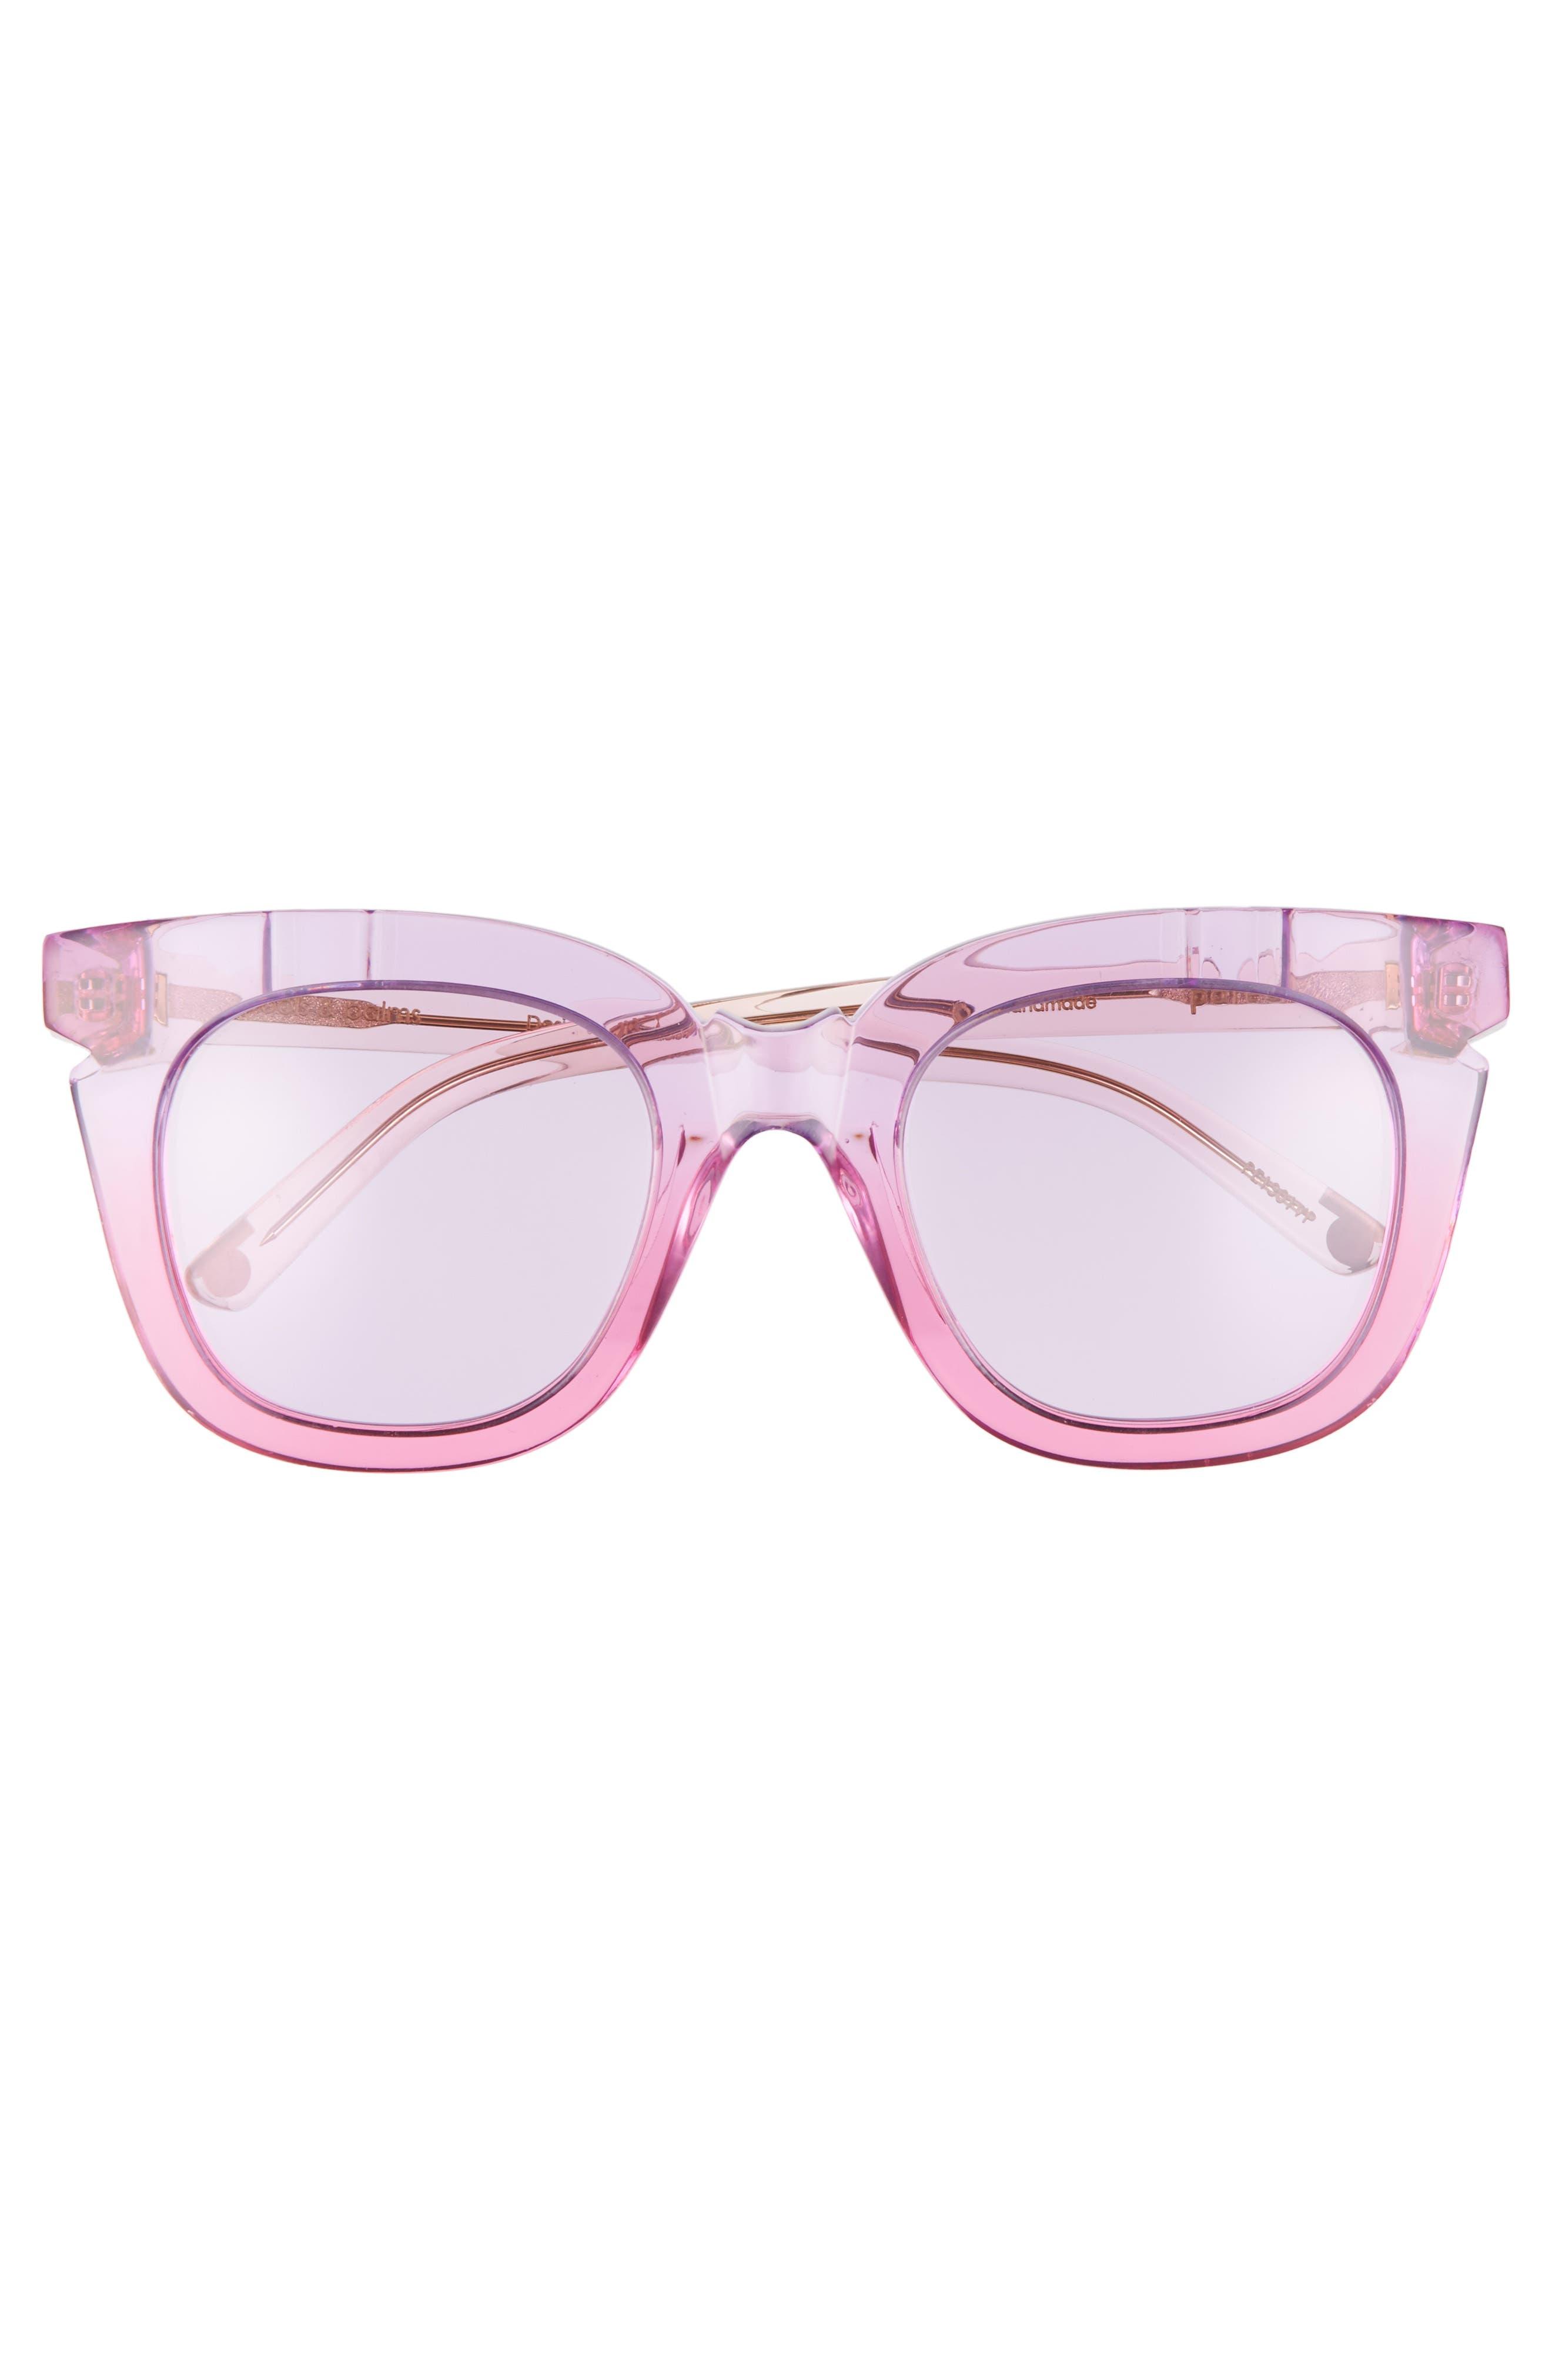 Pools & Palms 50mm Sunglasses,                             Alternate thumbnail 3, color,                             650